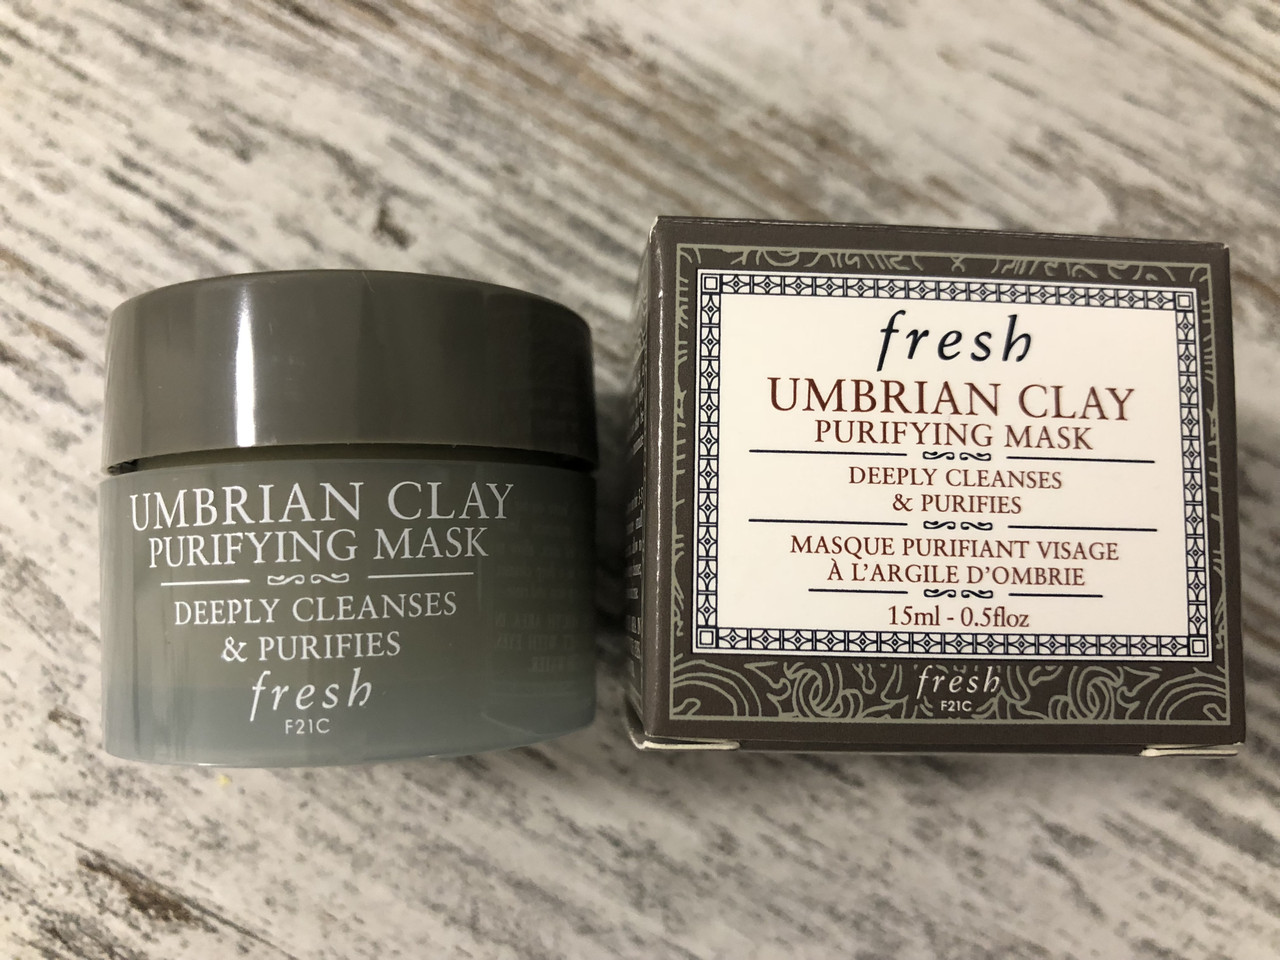 Глиняная очищающая маска для лица Fresh Umbrian Clay Purifying Mask